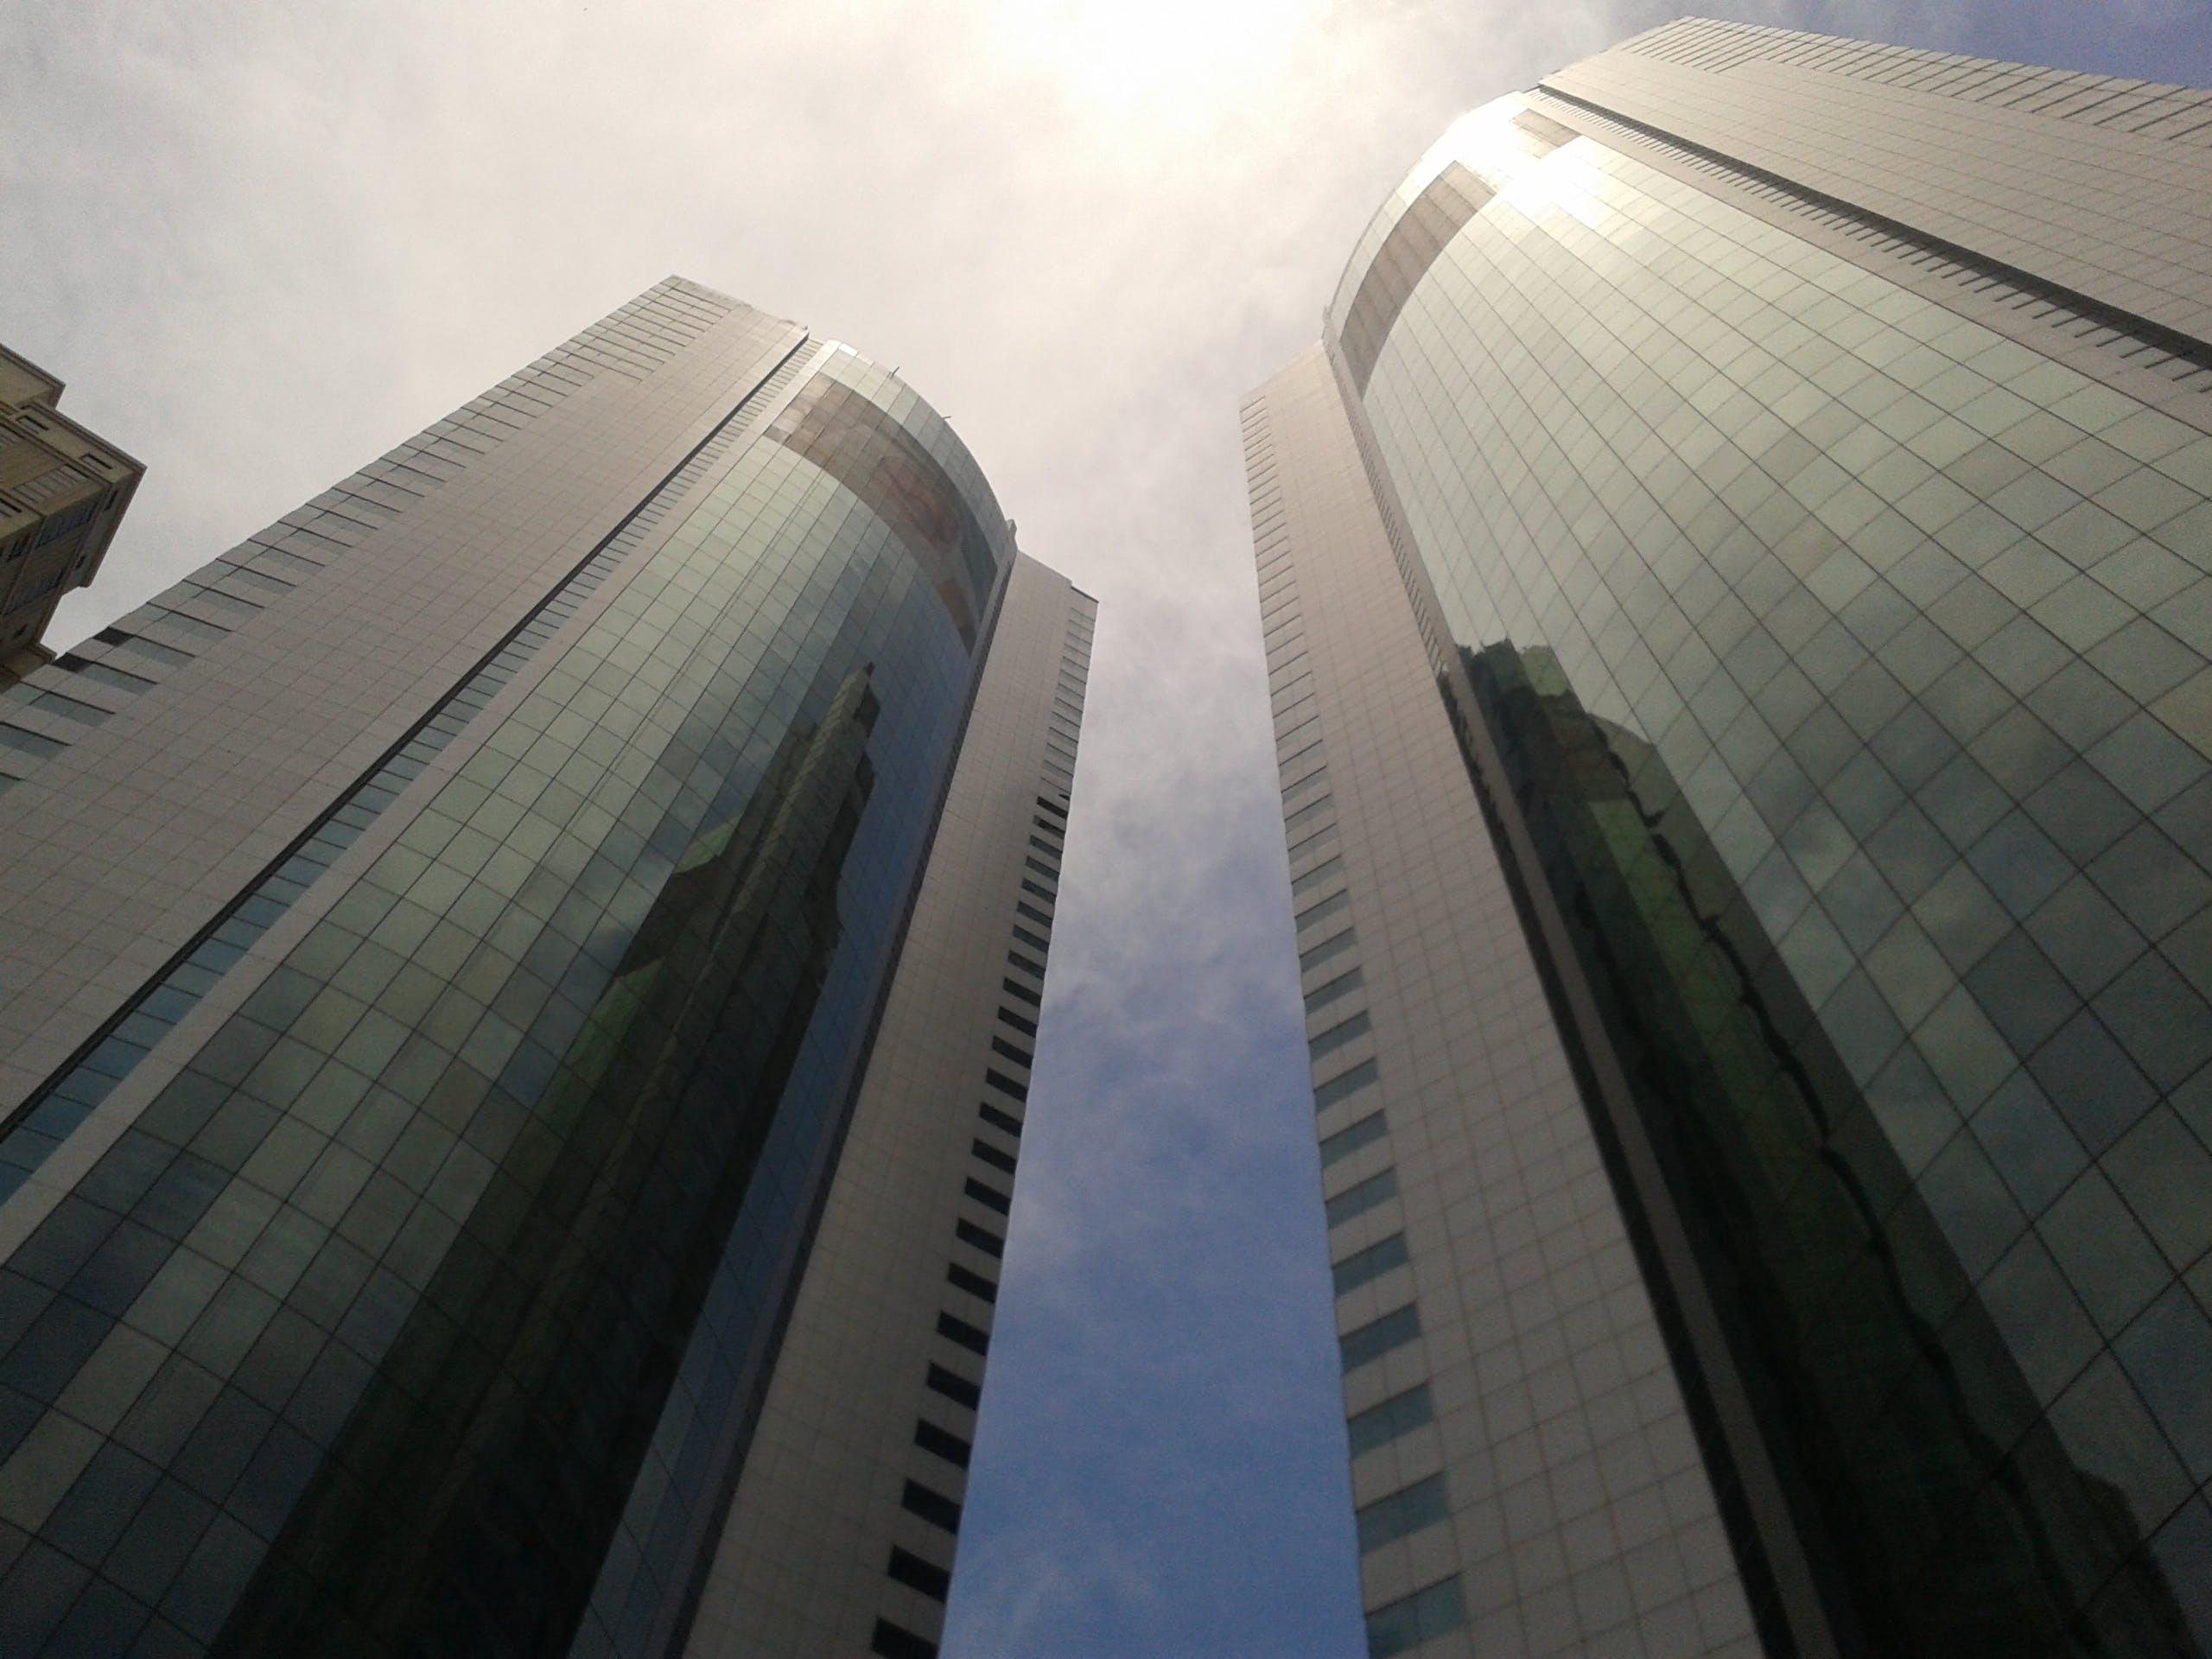 Low Angle Photo of Curtain Window Buildings